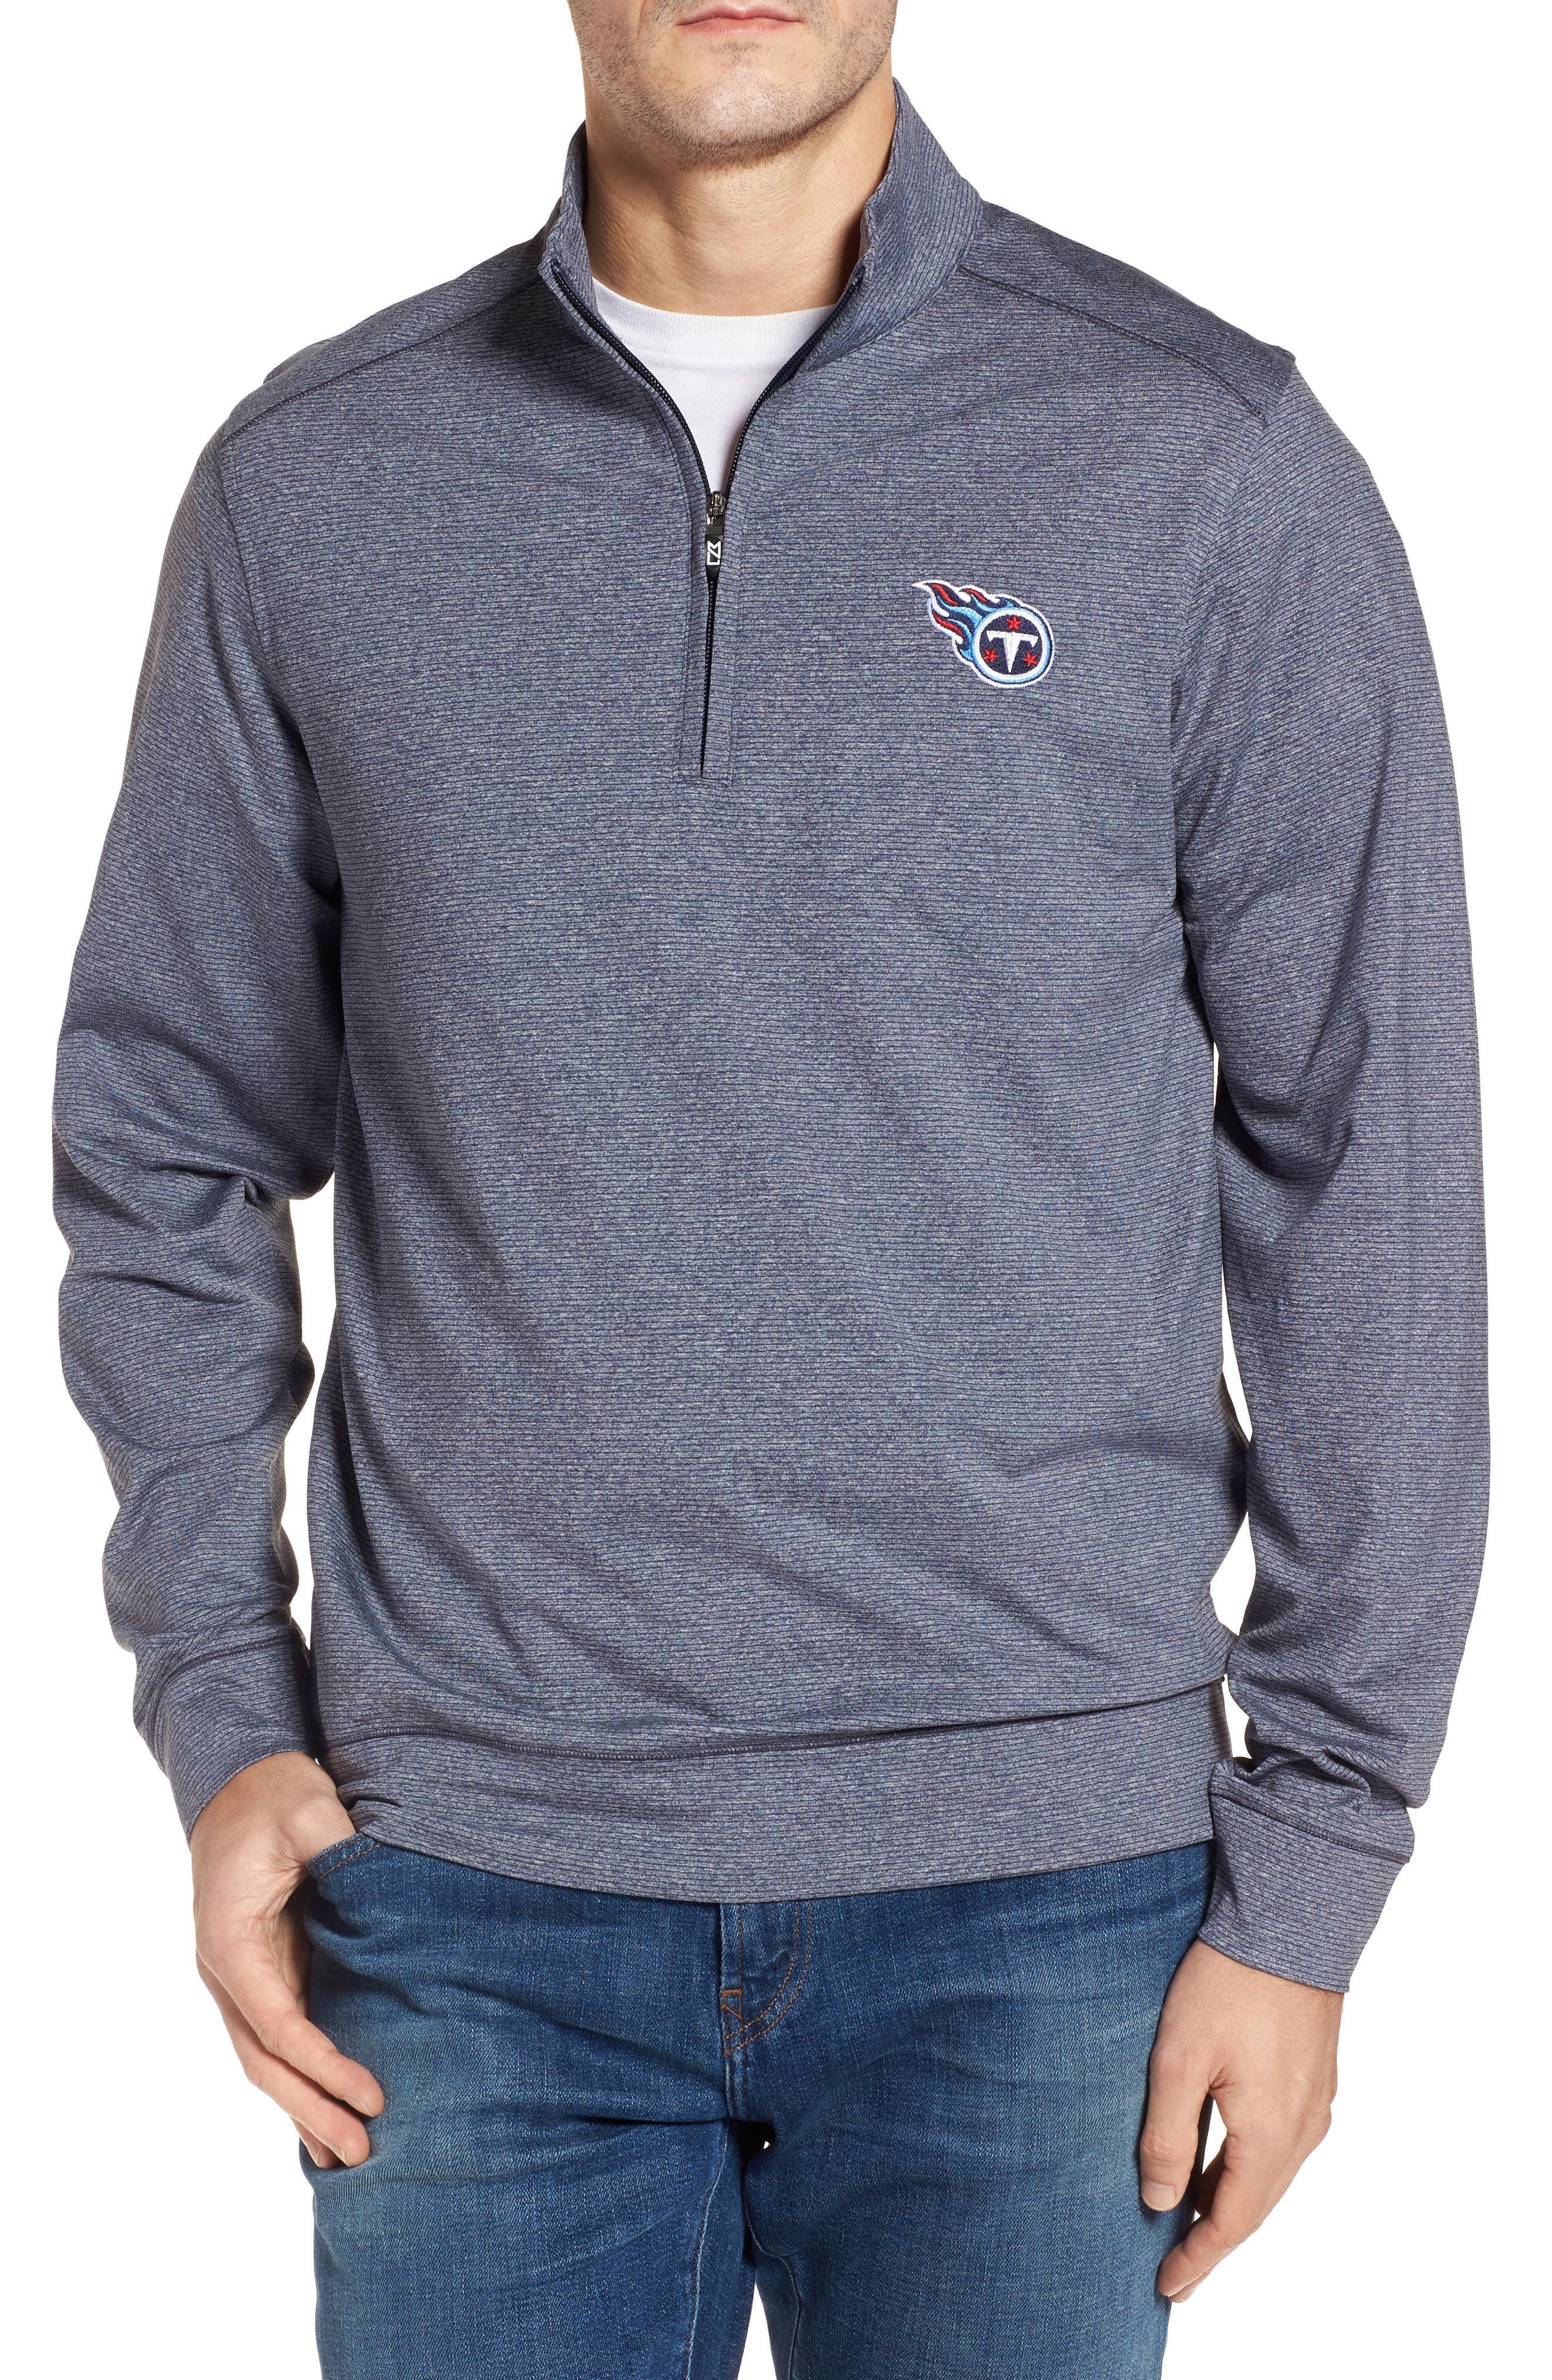 Cutter & Buck Shoreline - Tennessee Titans Half Zip Pullover